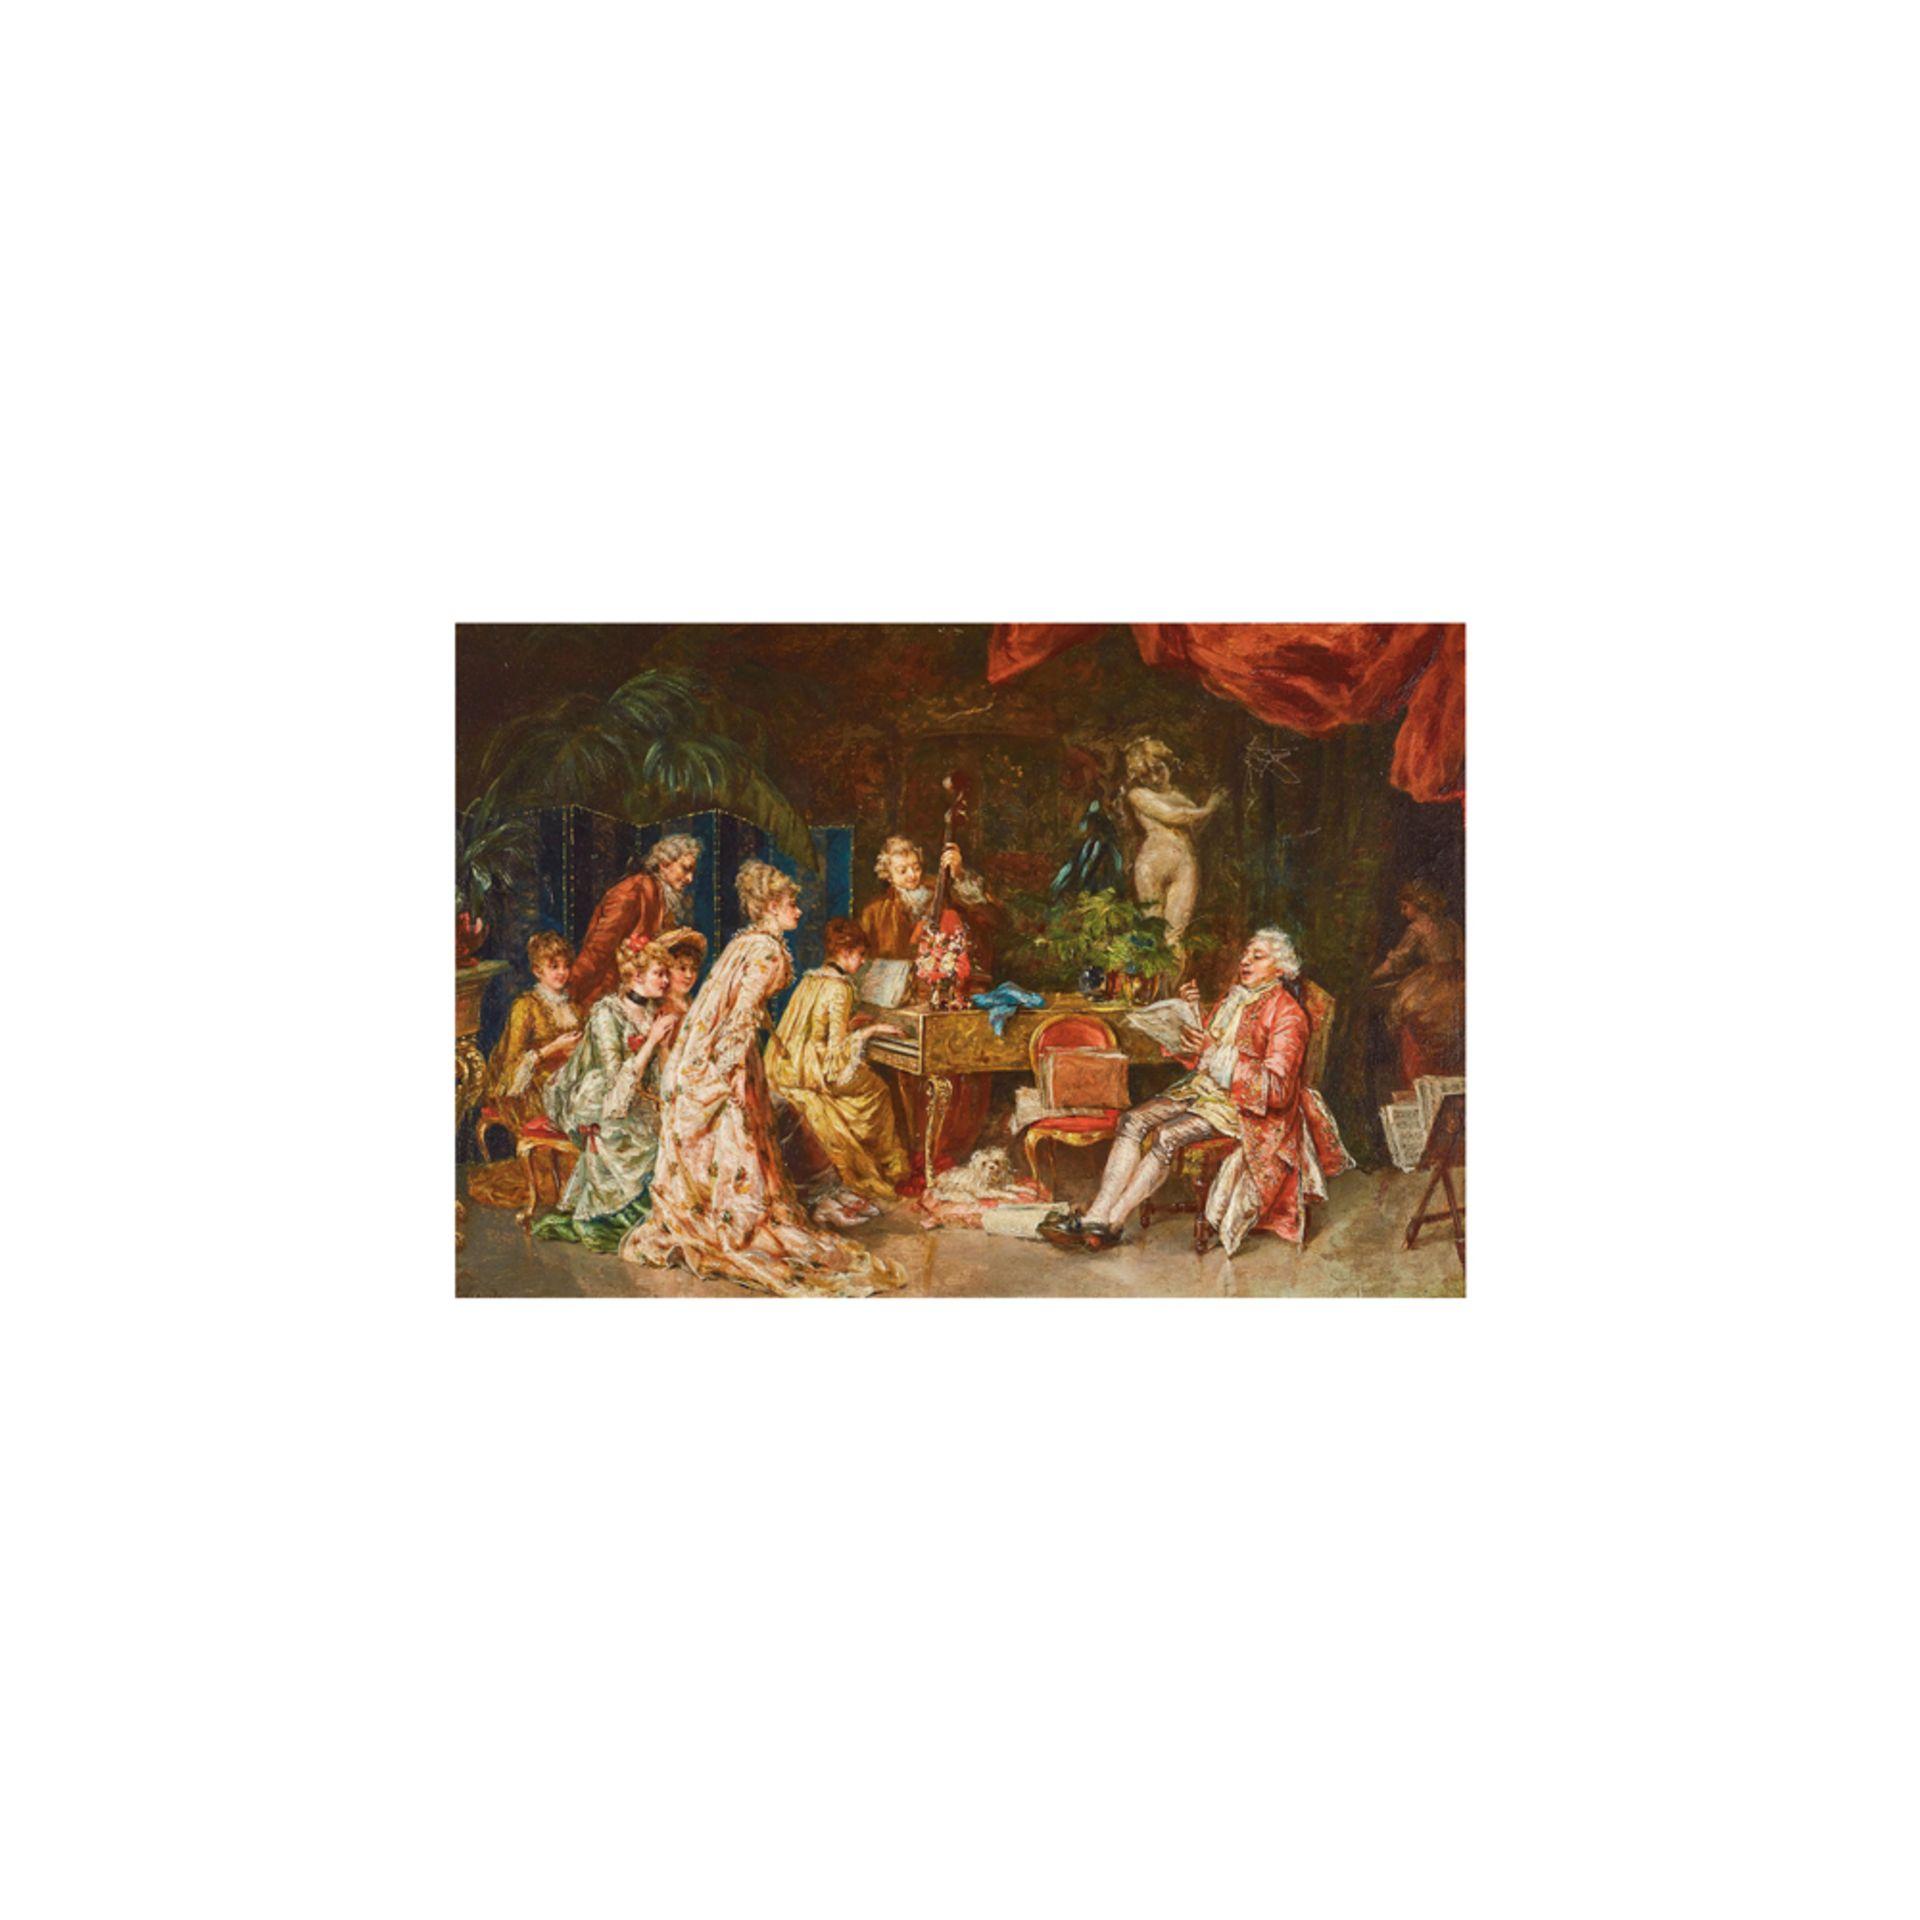 Los 24 - Escuela española, s.XIX. Recital de música. Óleo sobre tabla.